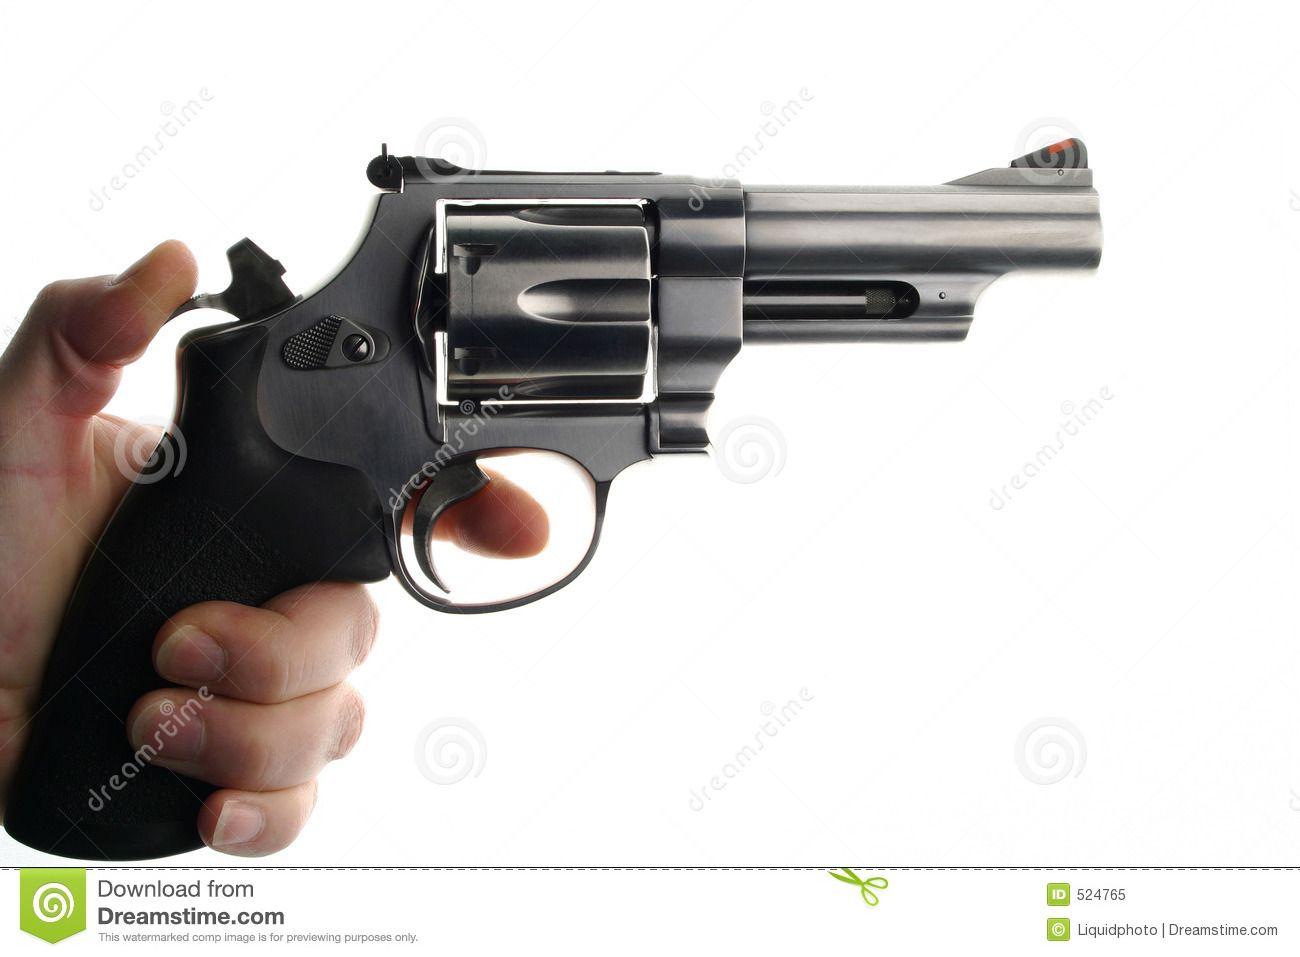 Hand Holding Handgun Or Pistol Hand Guns Holding Hands Image